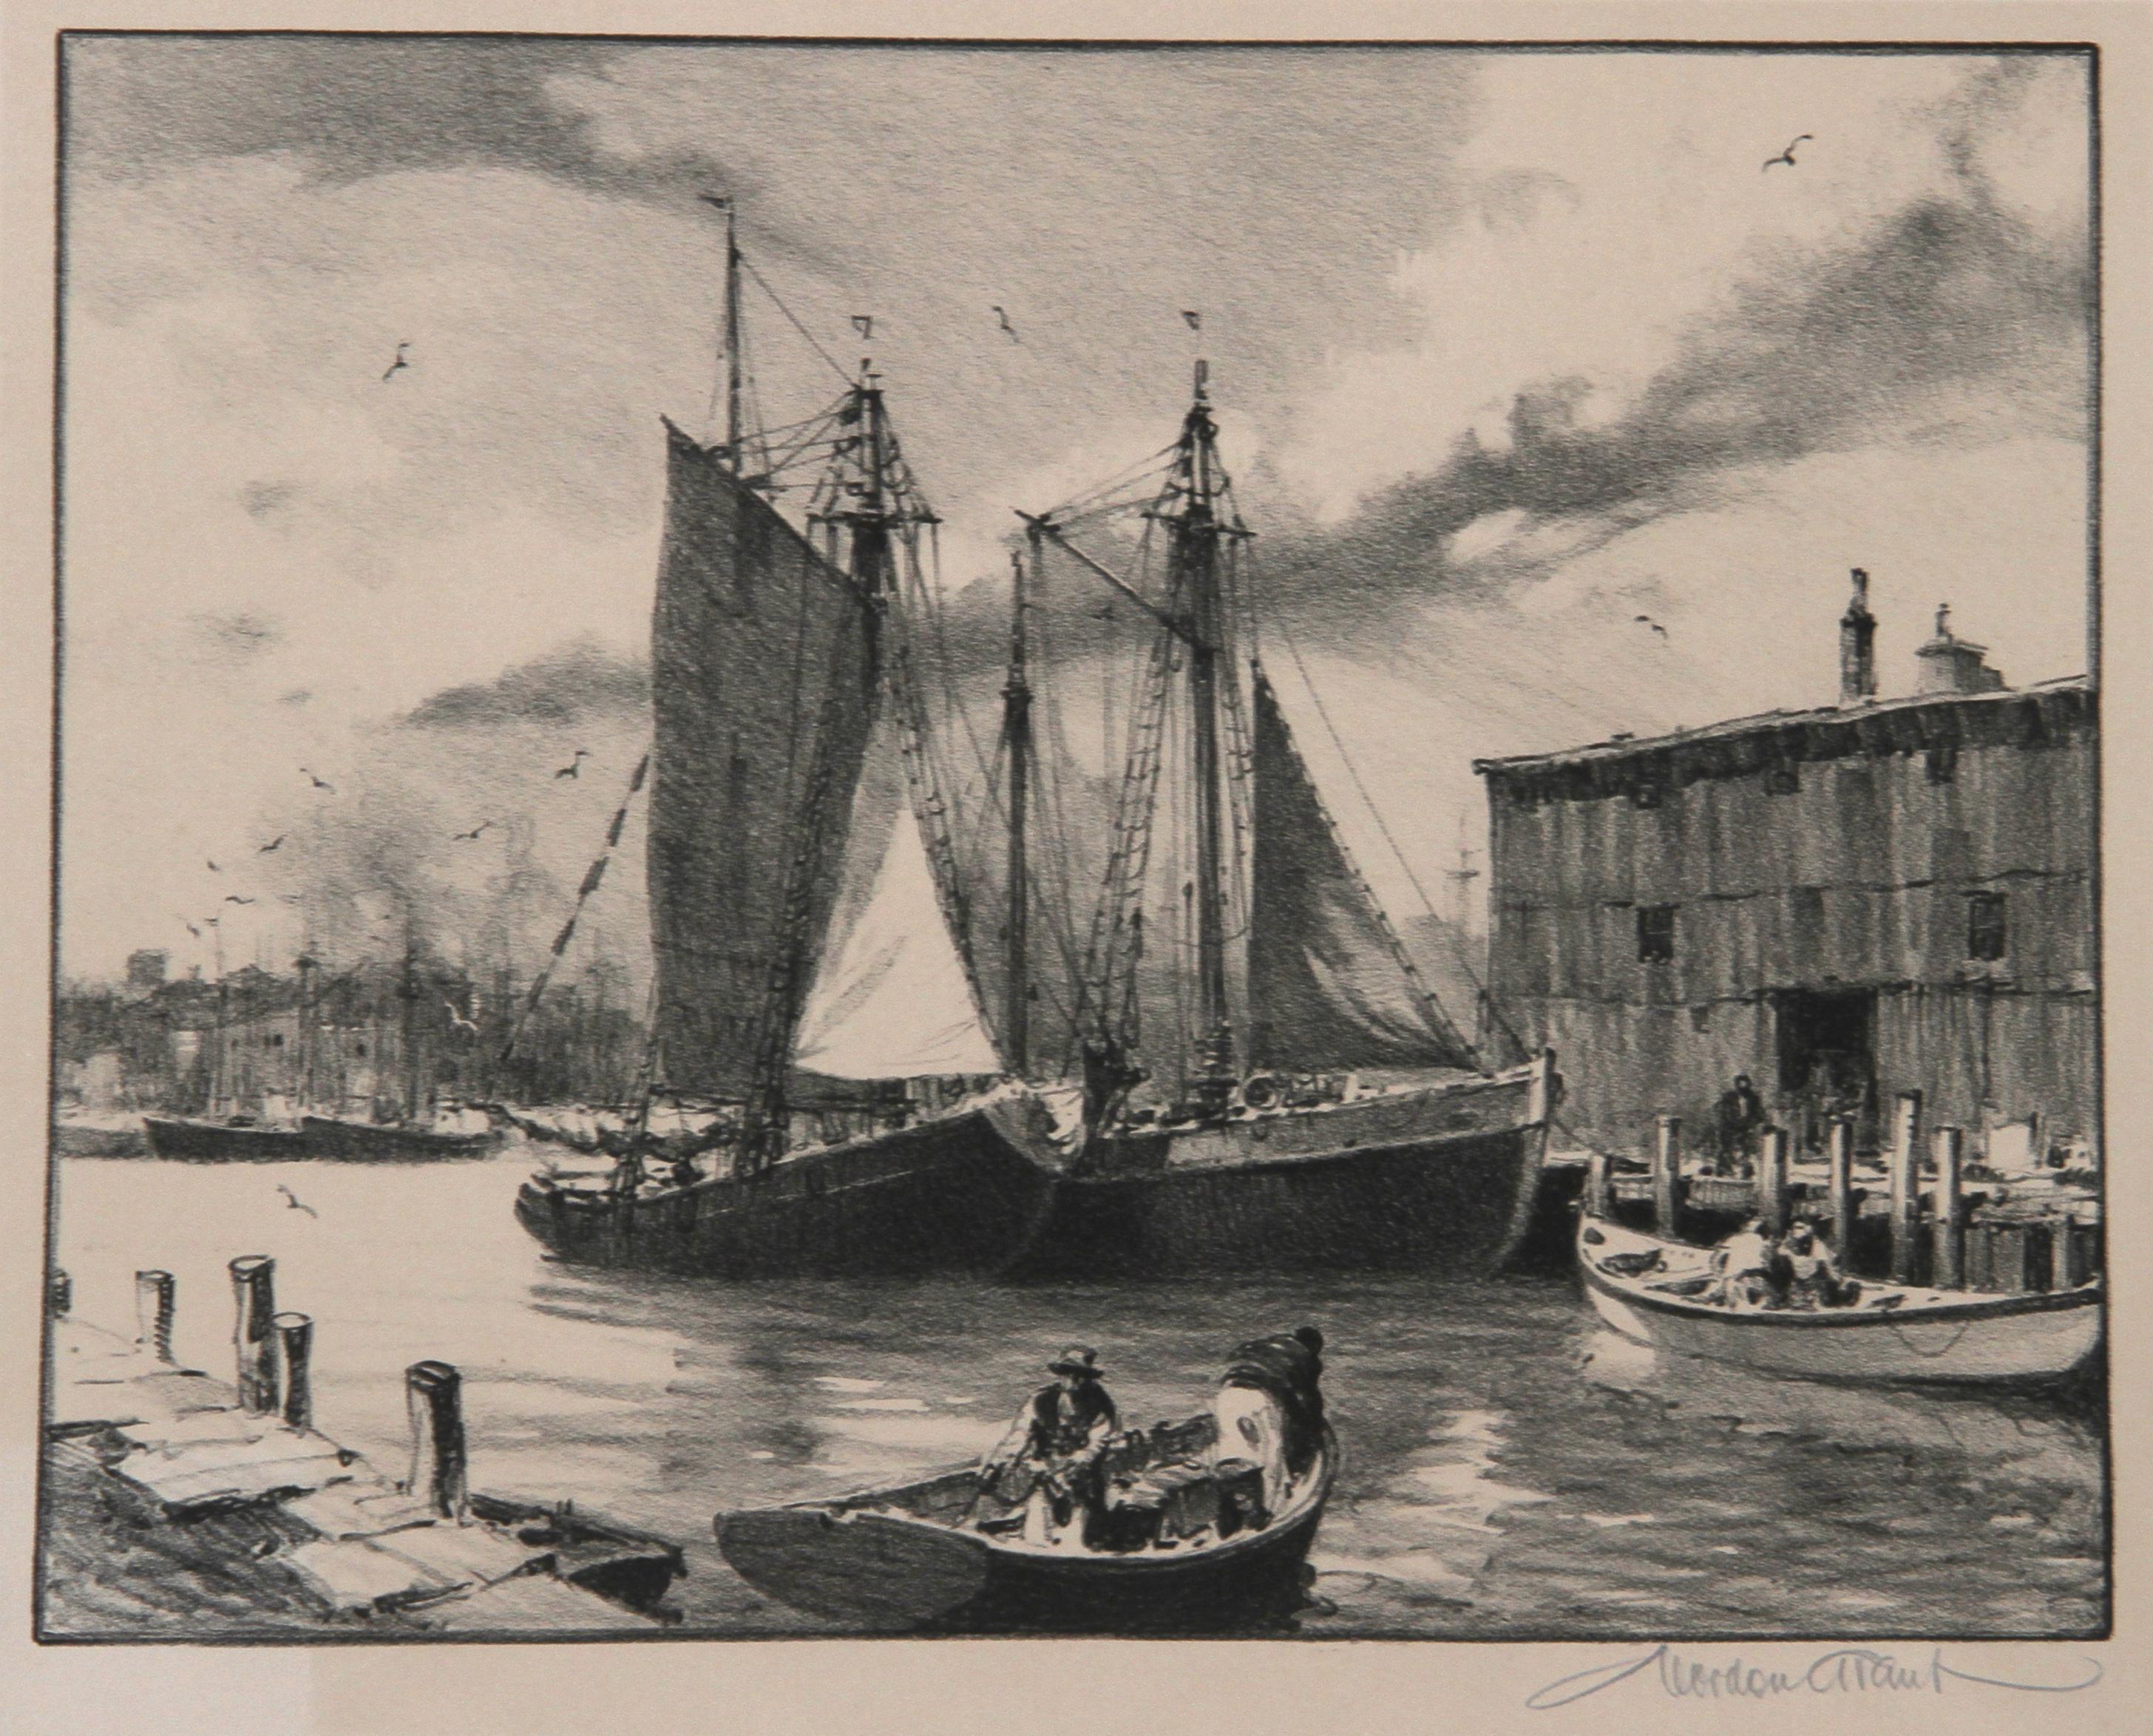 Fisherman's Haven, Lithograph by Gordon Grant